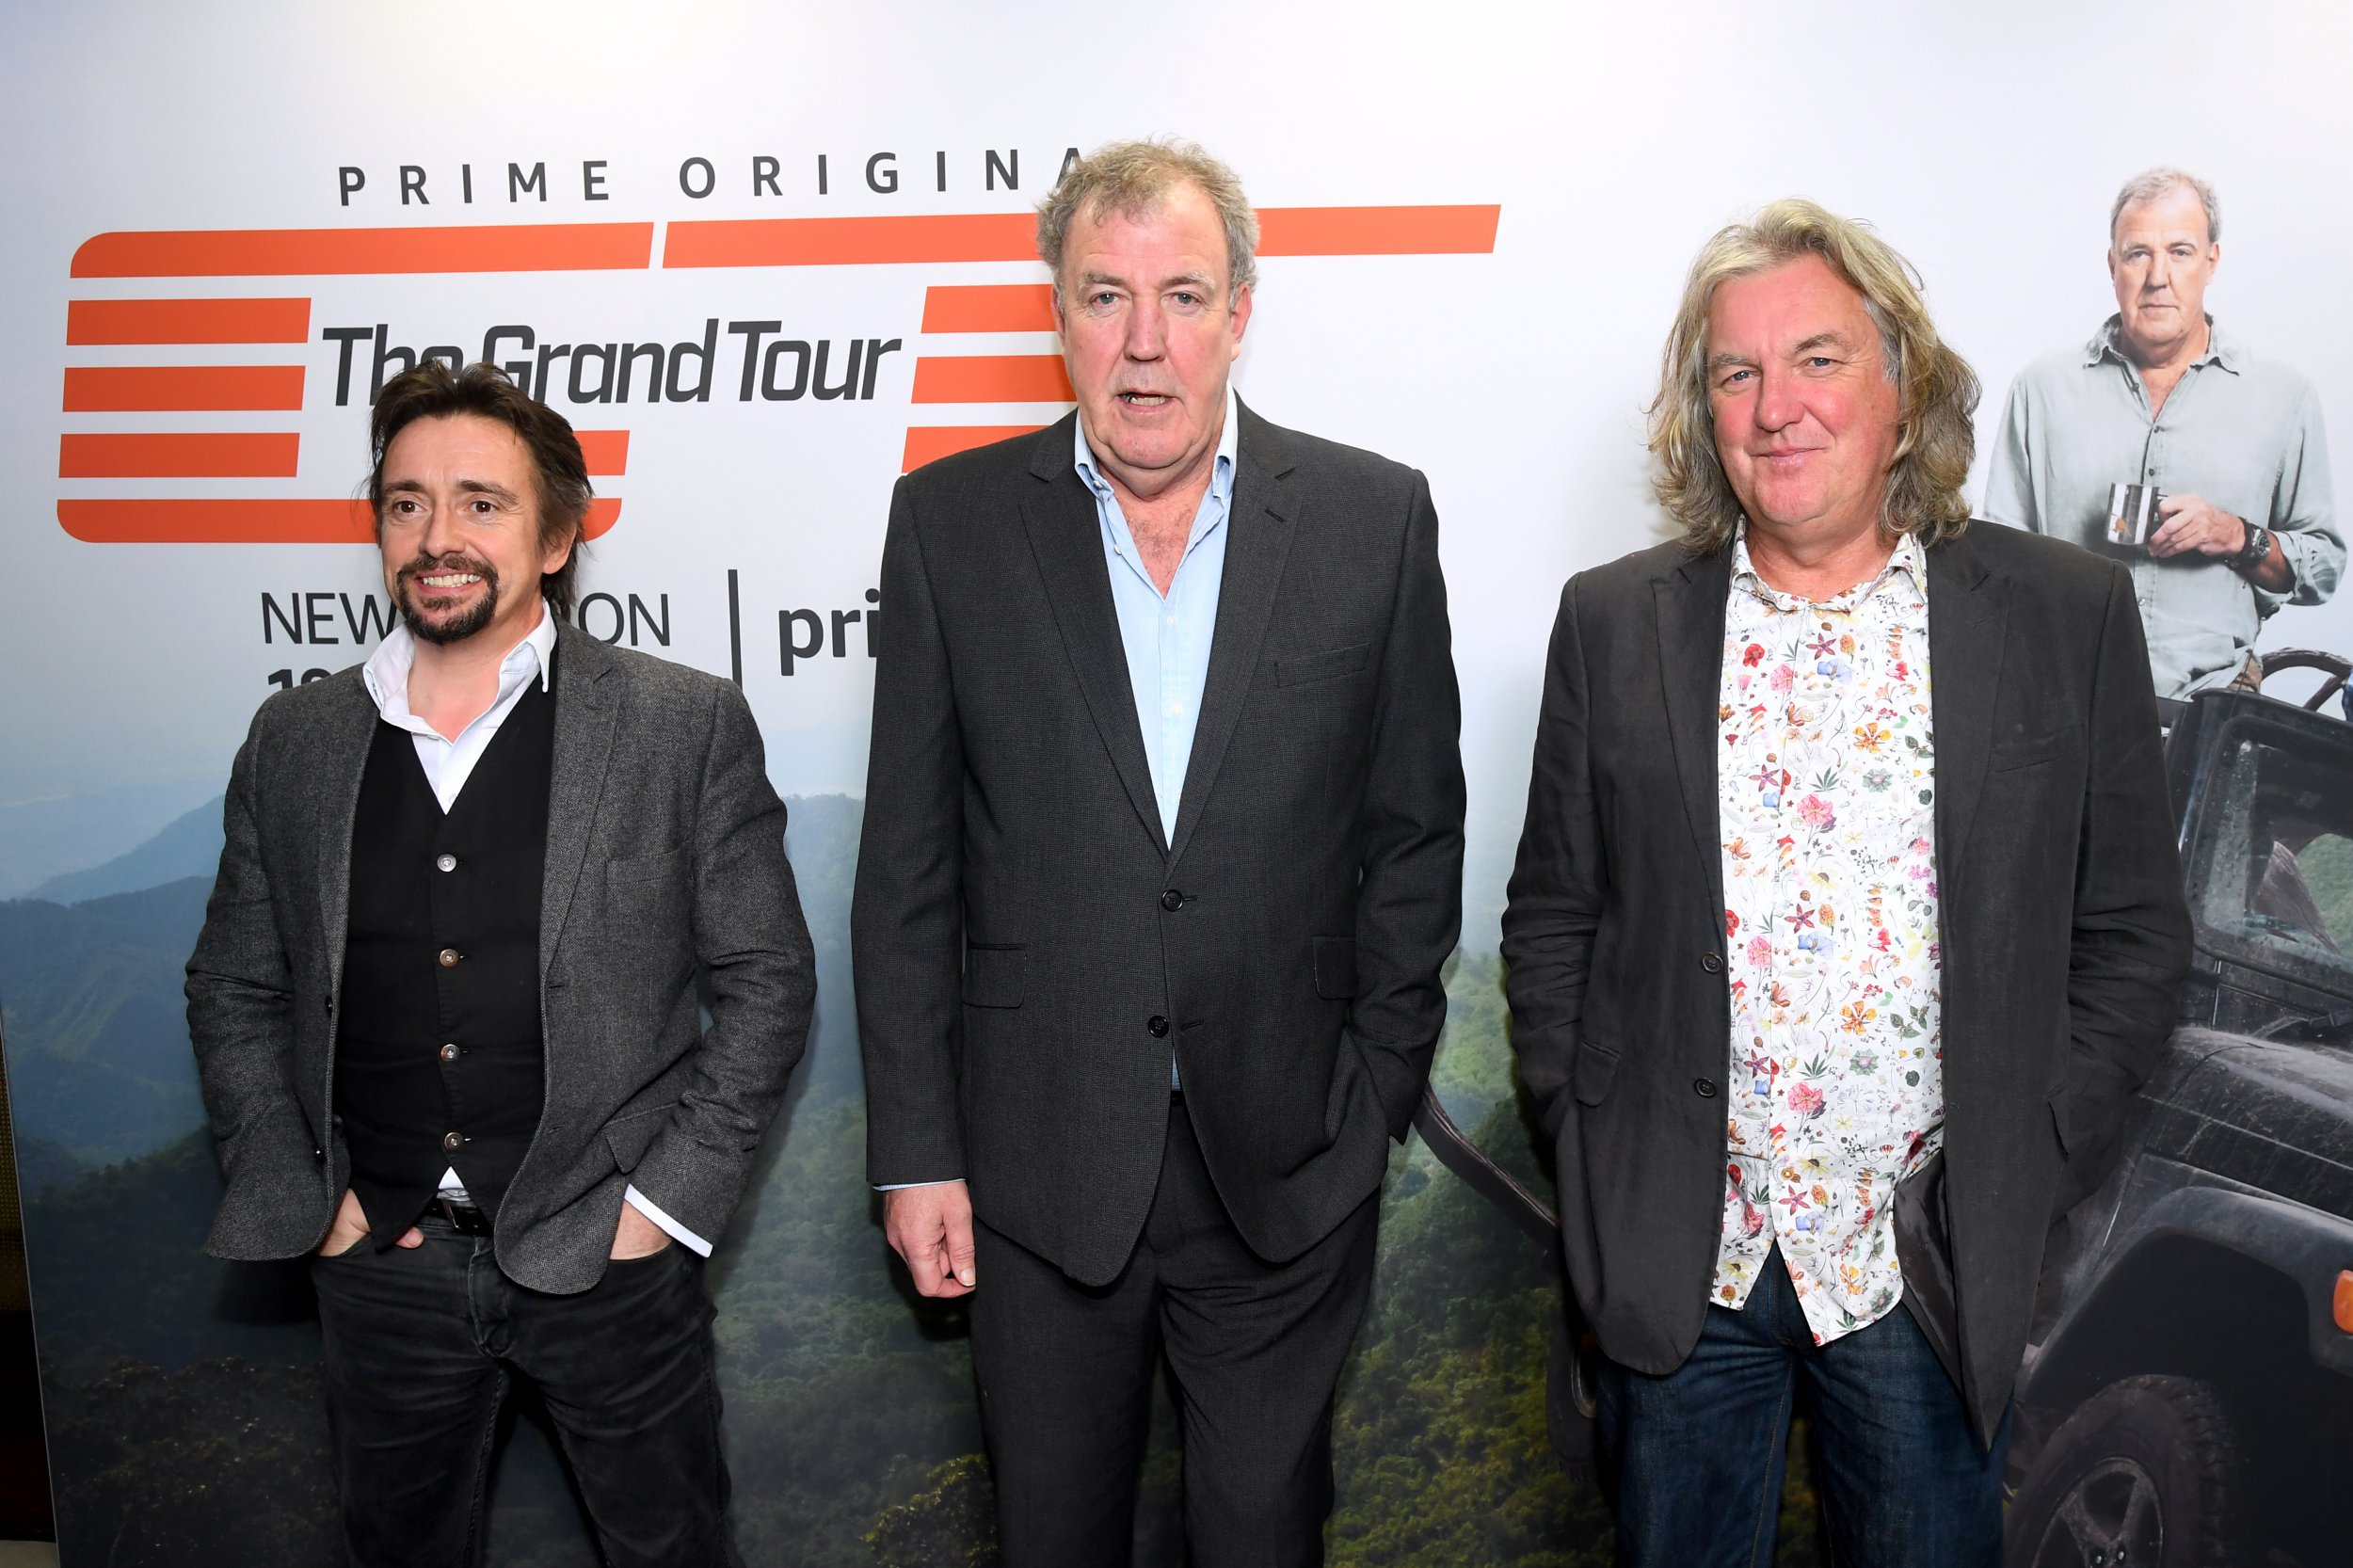 The Grand Tour episode scrapped over terrorist threats